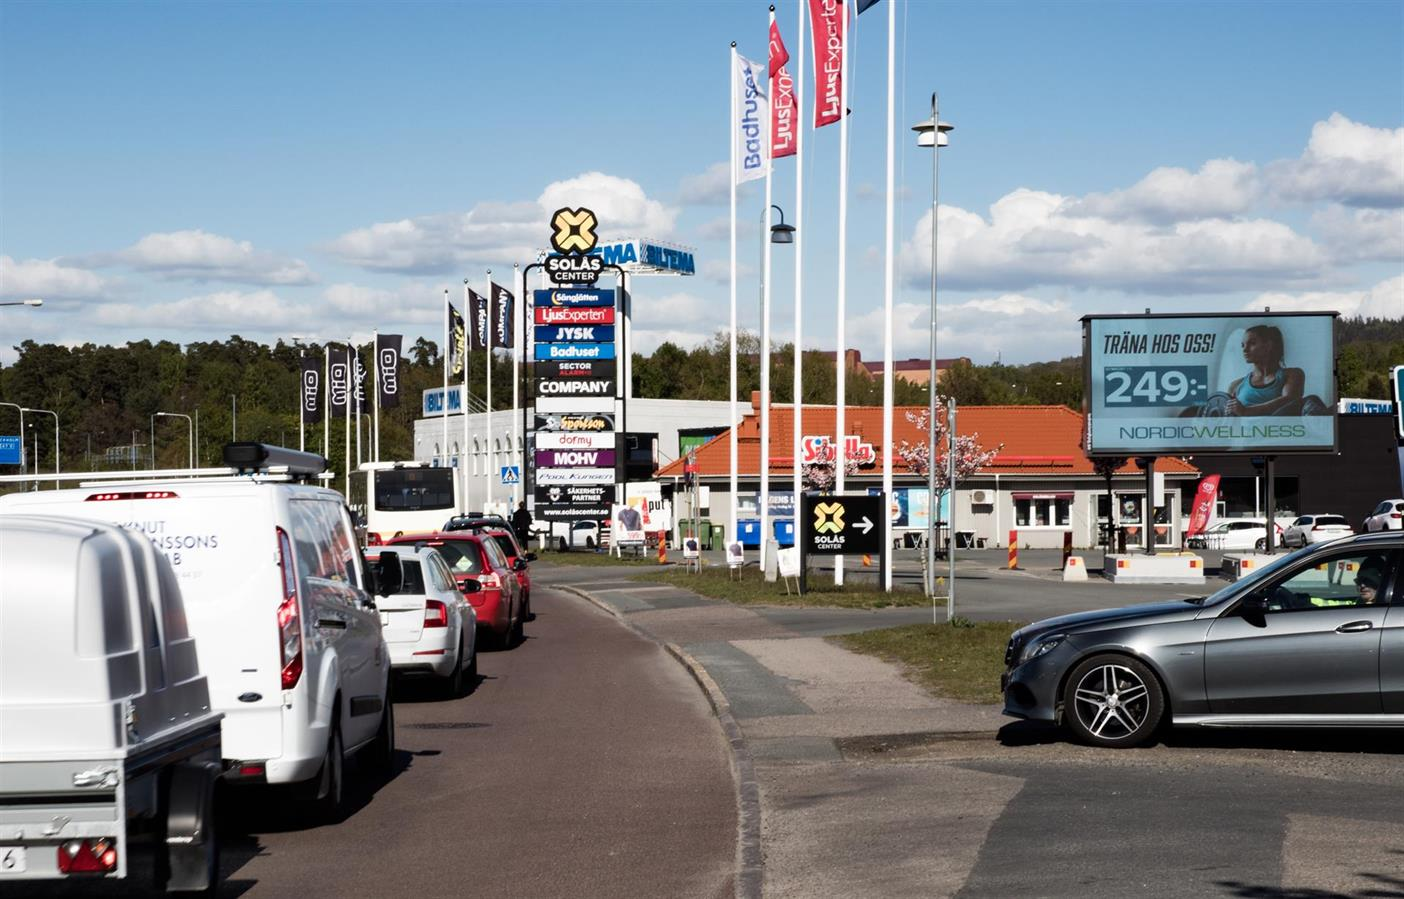 Nordic Wellness - Solåscenter